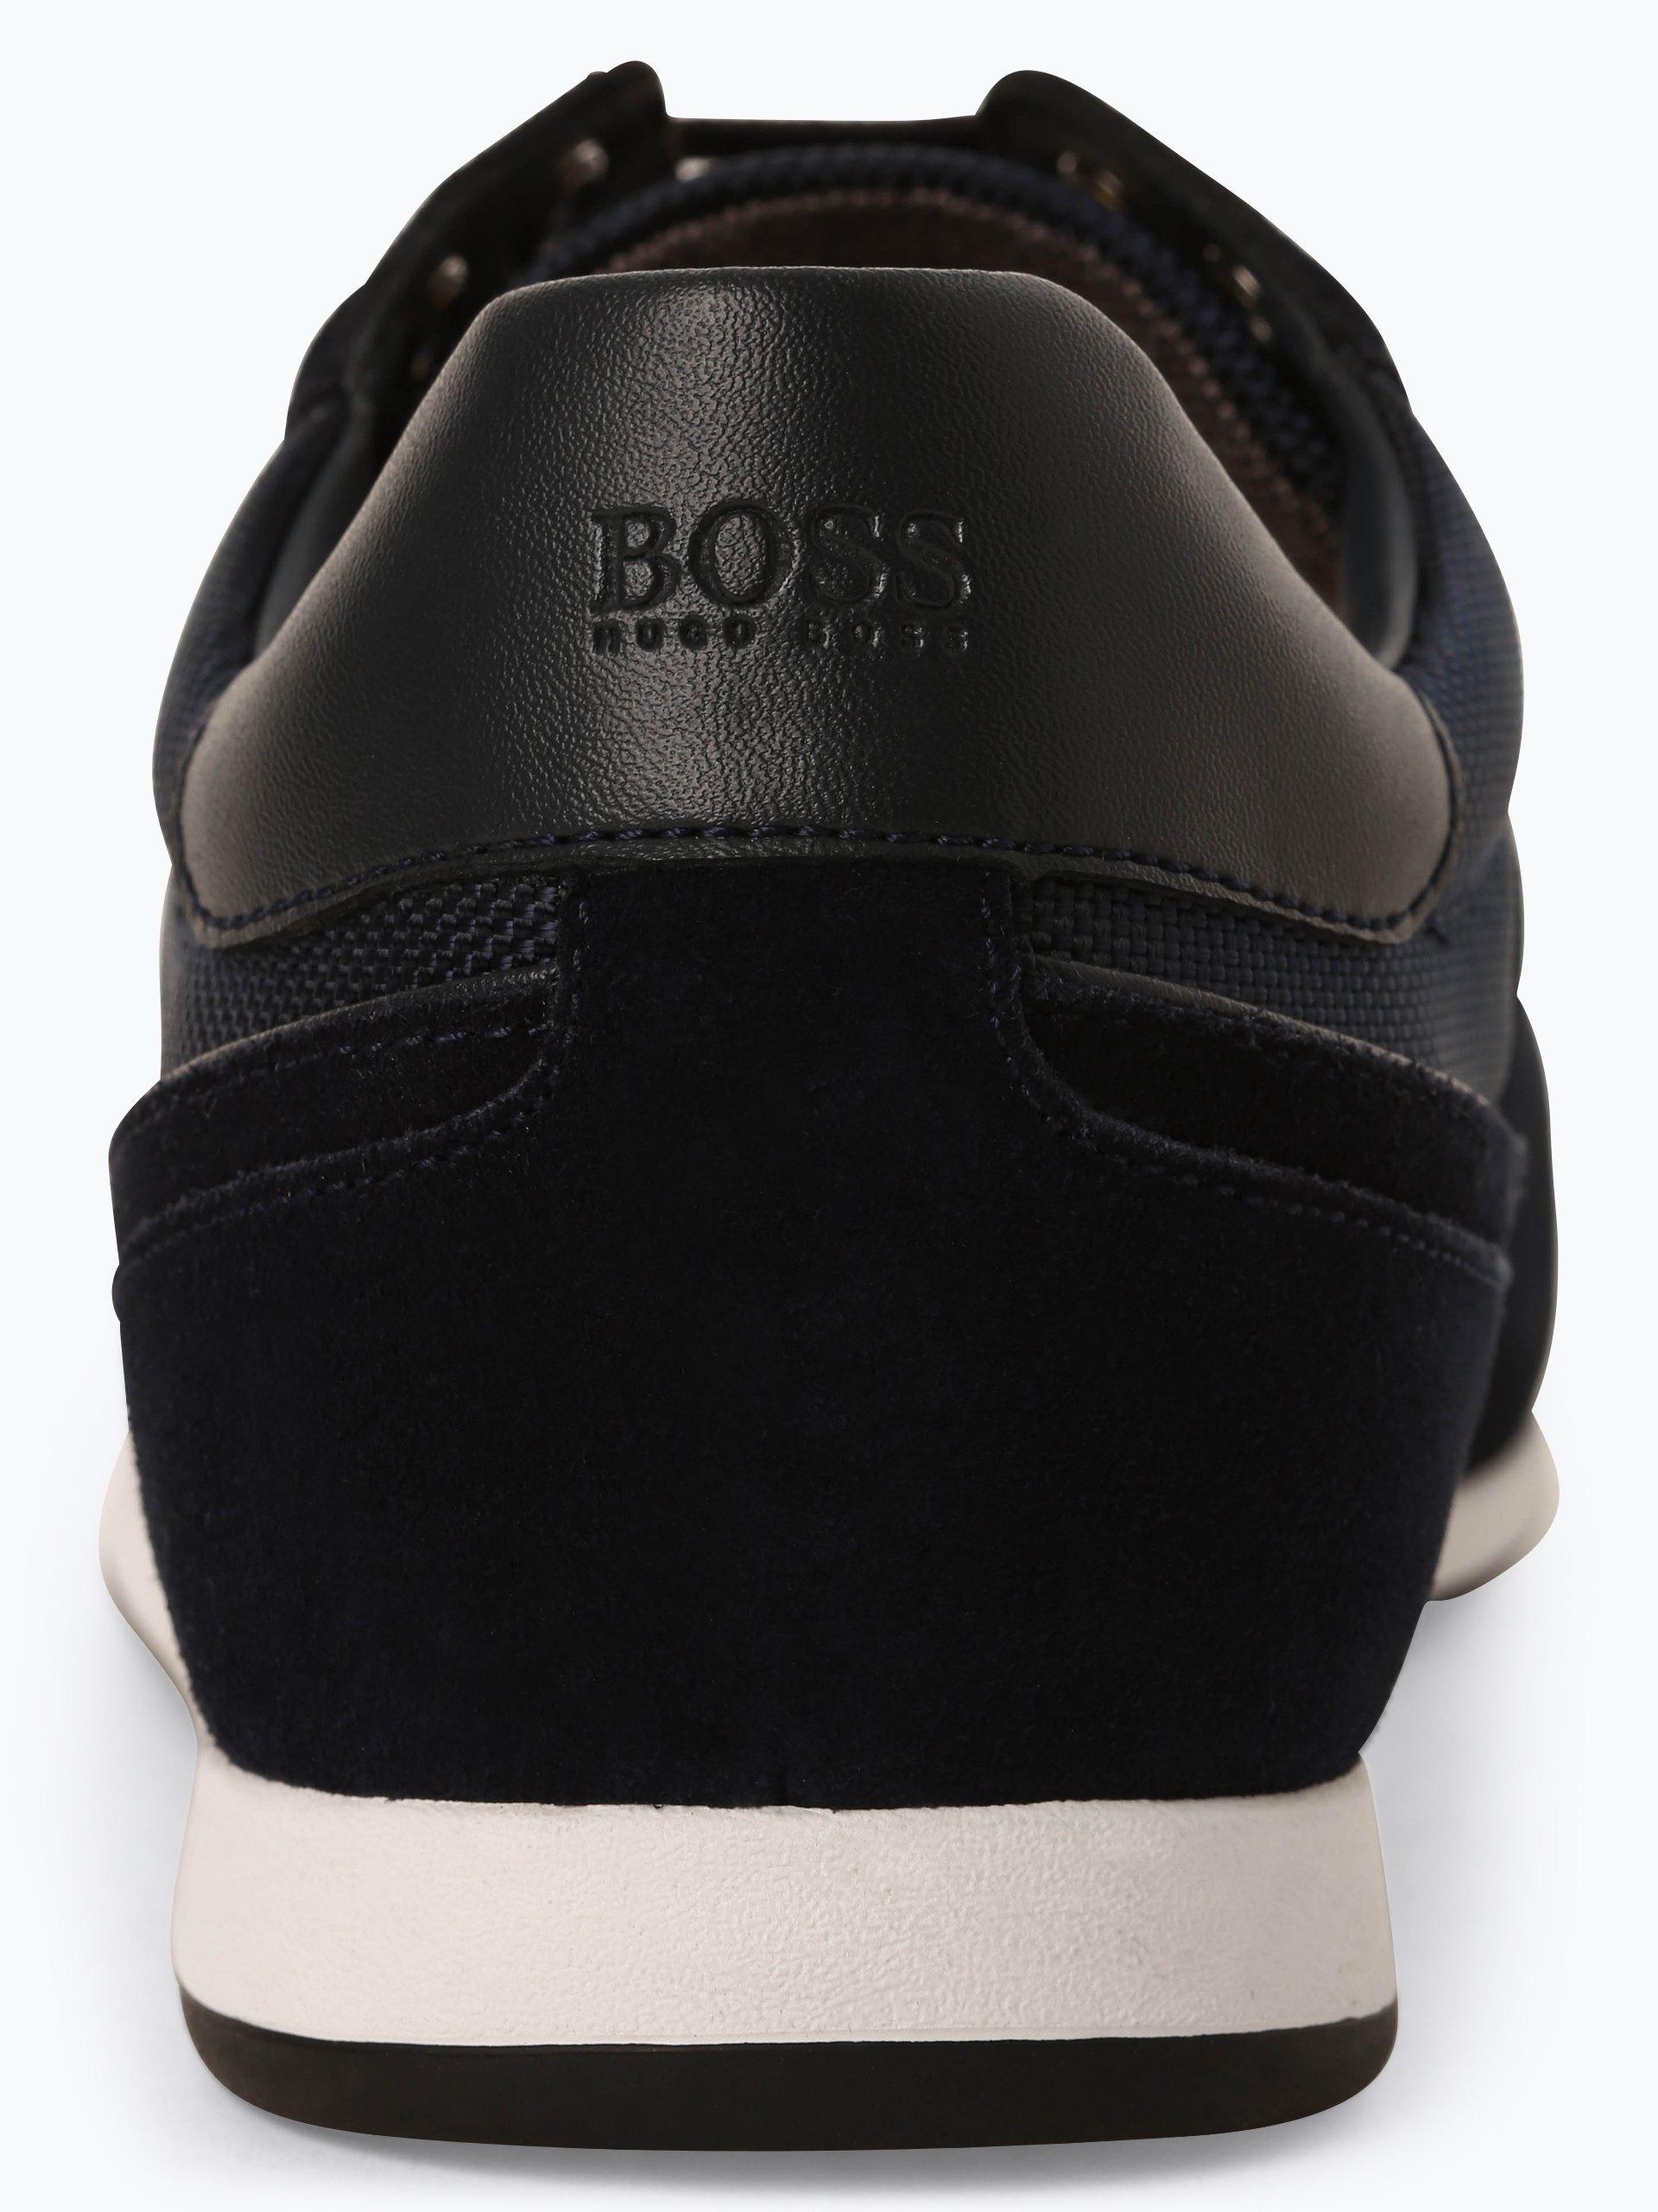 BOSS Athleisure Herren Sneaker mit Leder-Anteil - Maze_Lowp_mx